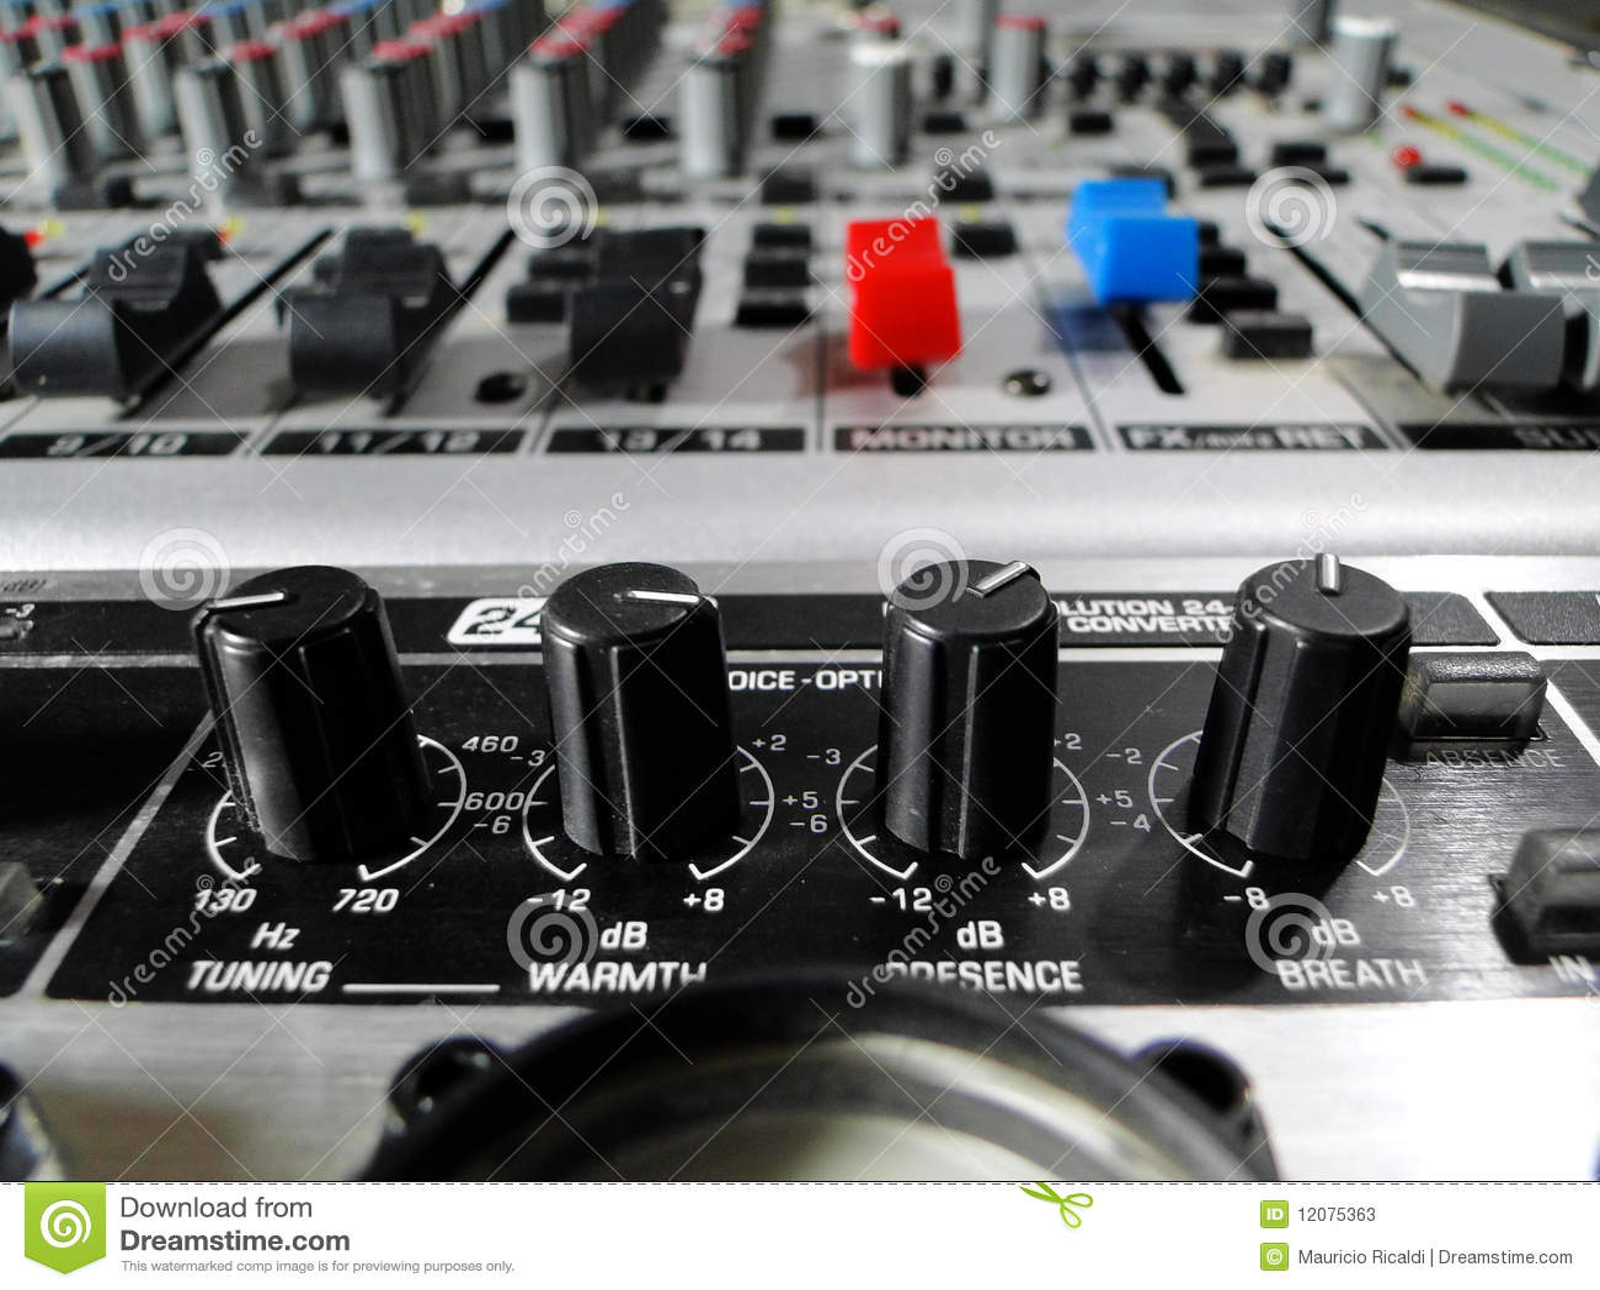 how to close volume mixer